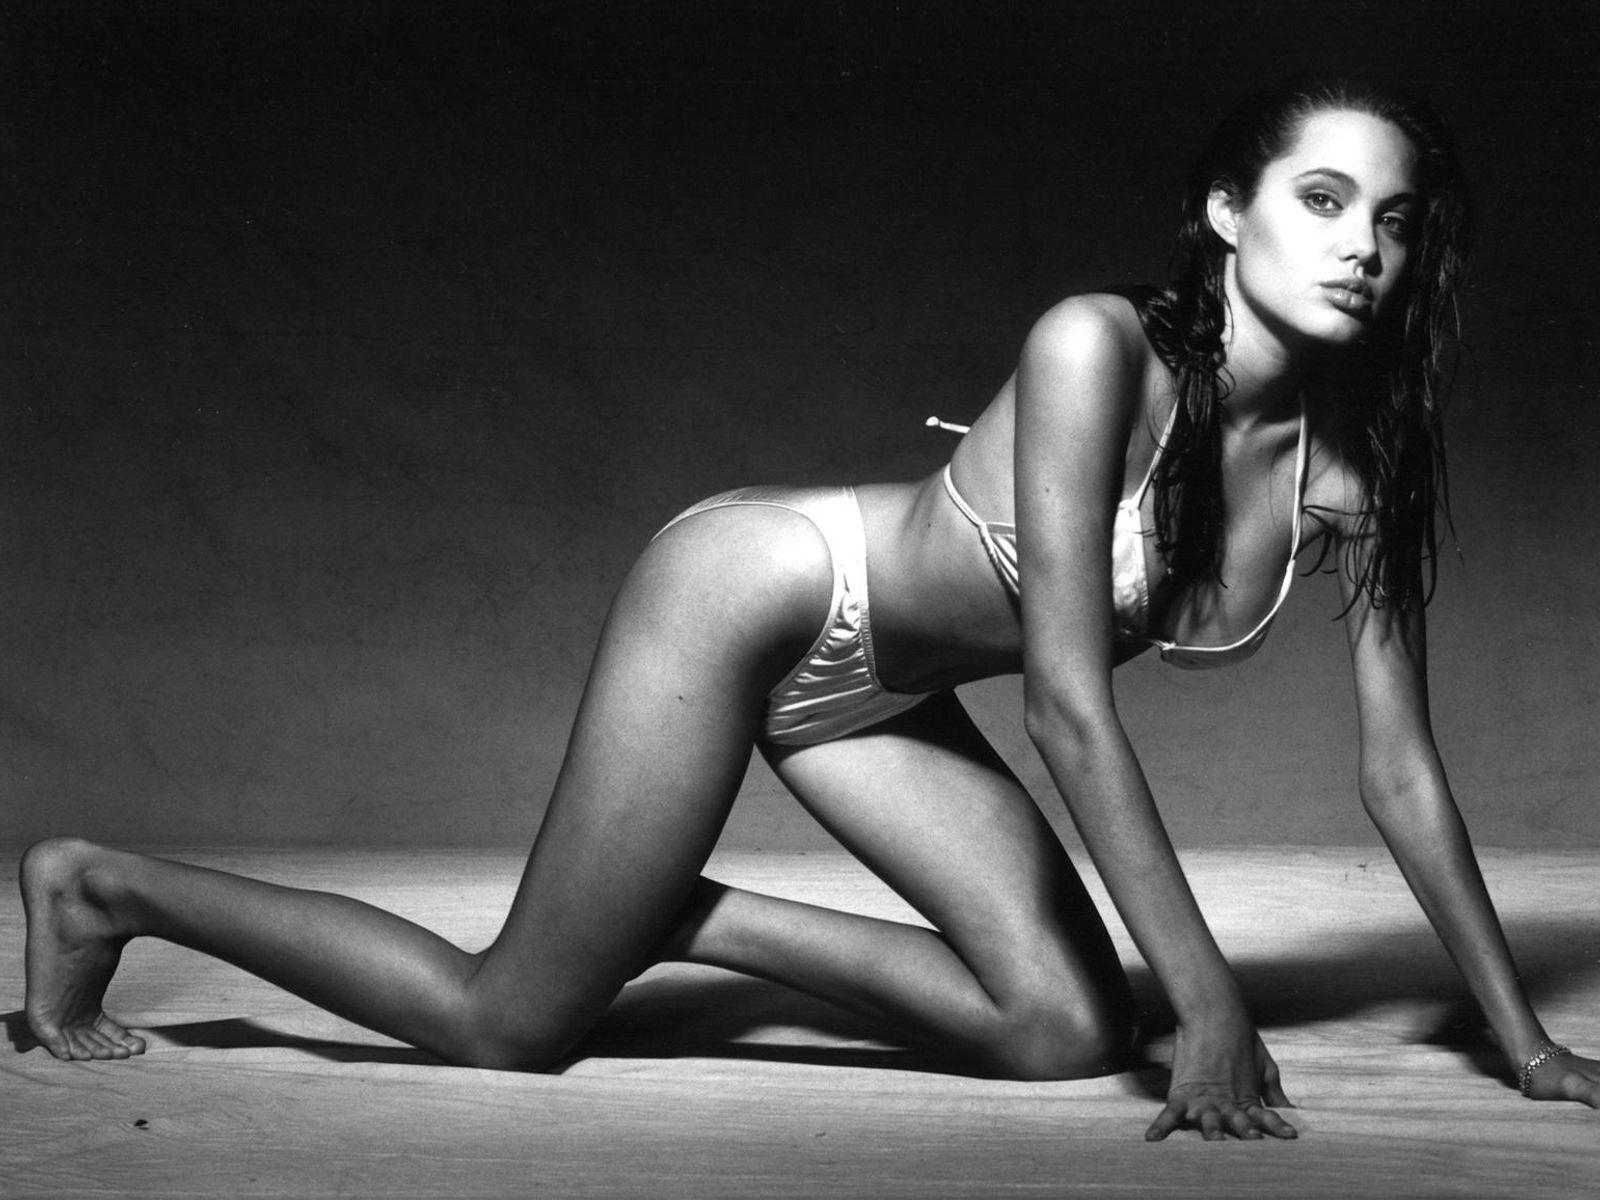 angelina-jolie-bikini.jpg